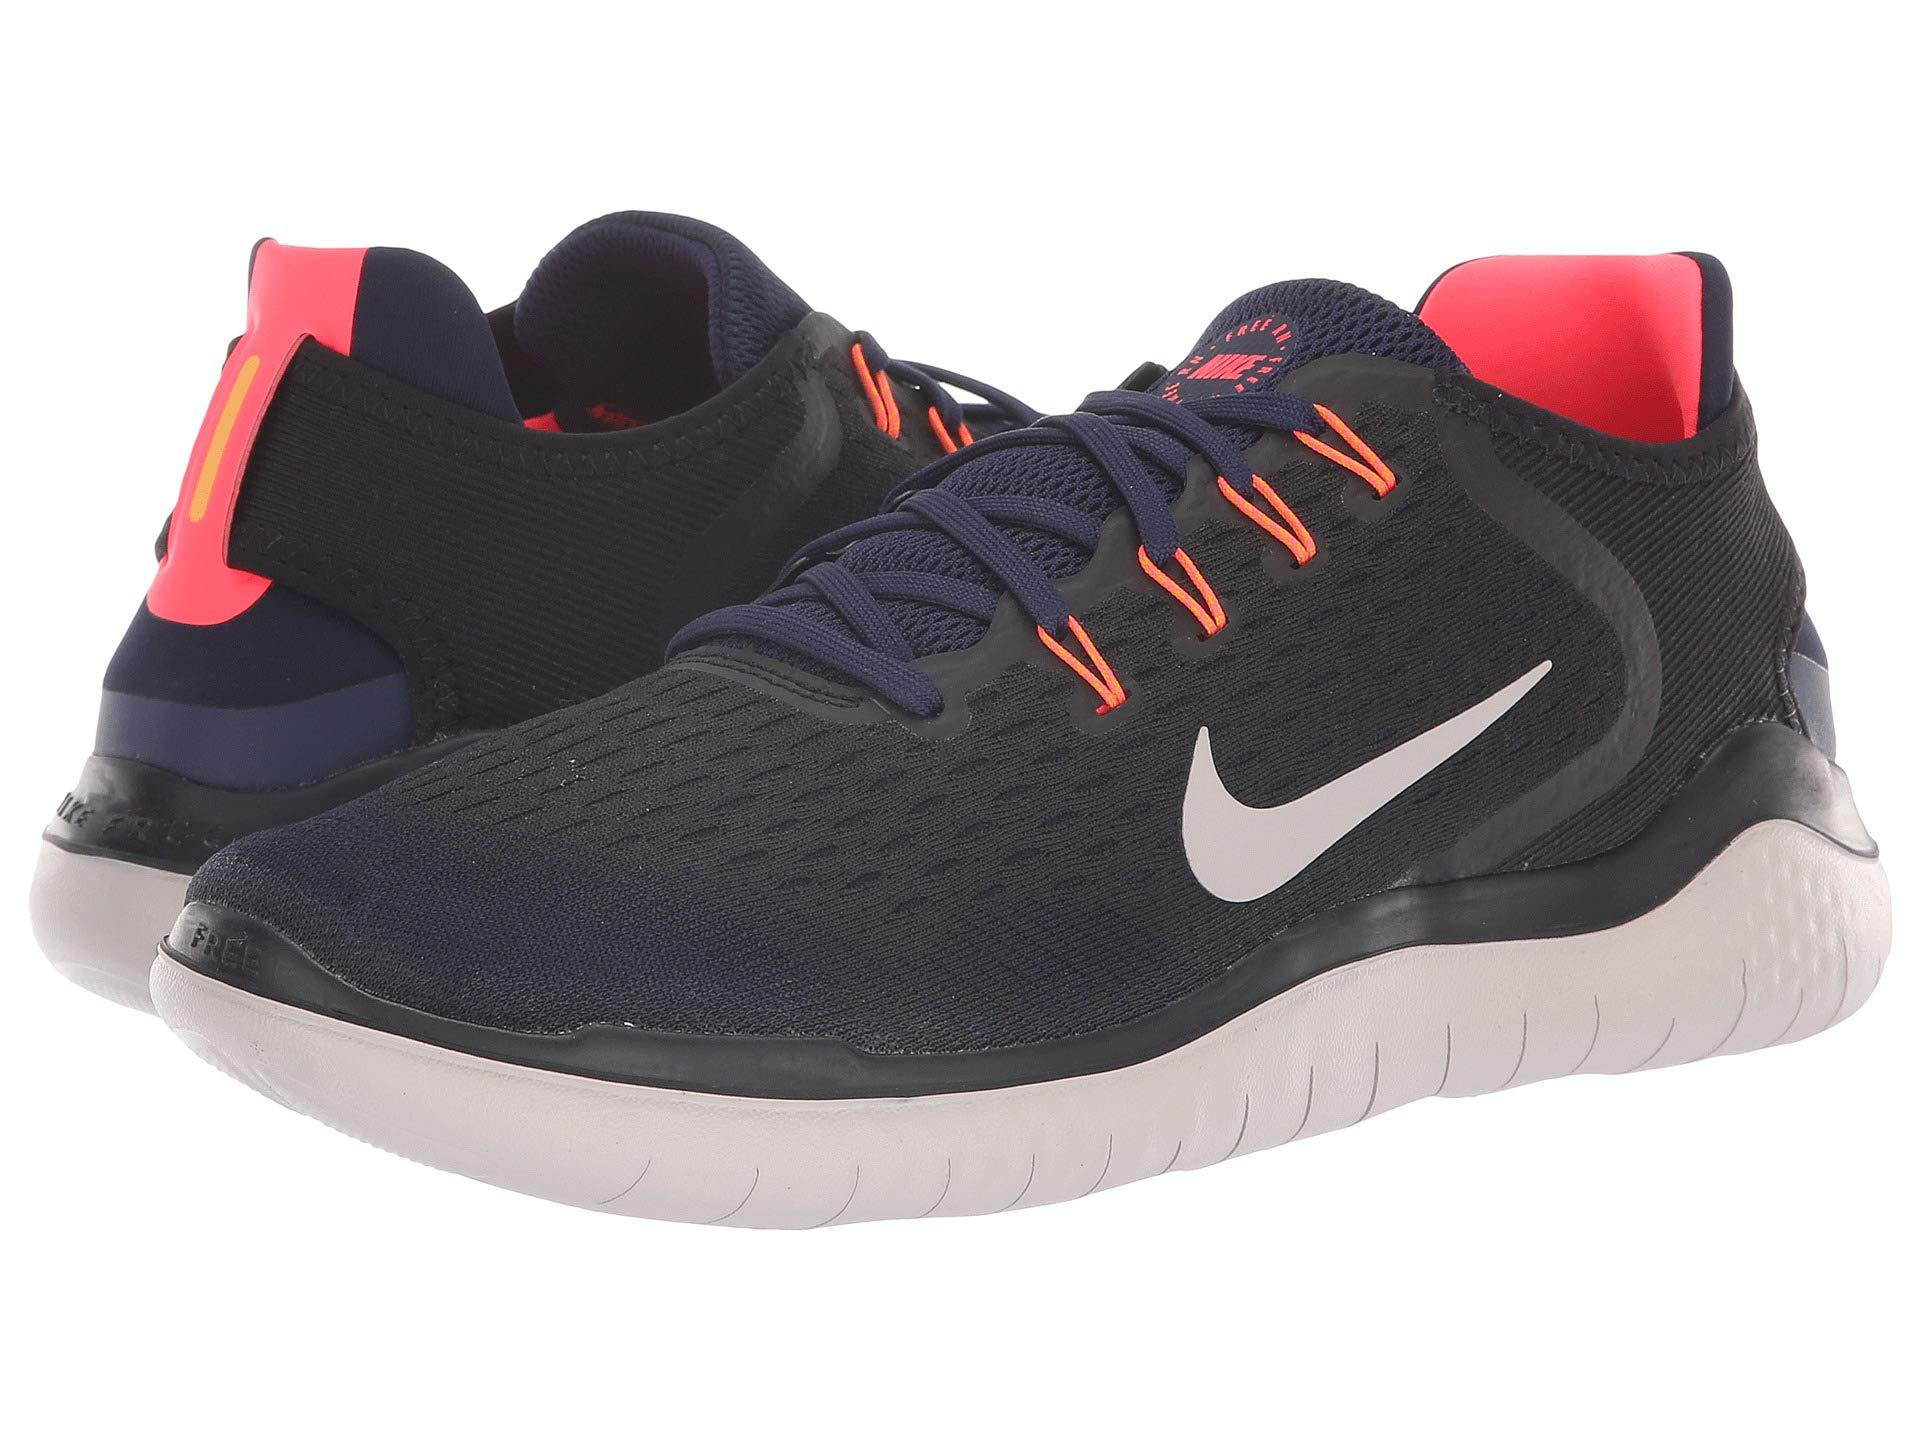 d7c410b082e1a Nike Men S Free Rn 2018 Running Shoes Black - Style Guru  Fashion ...